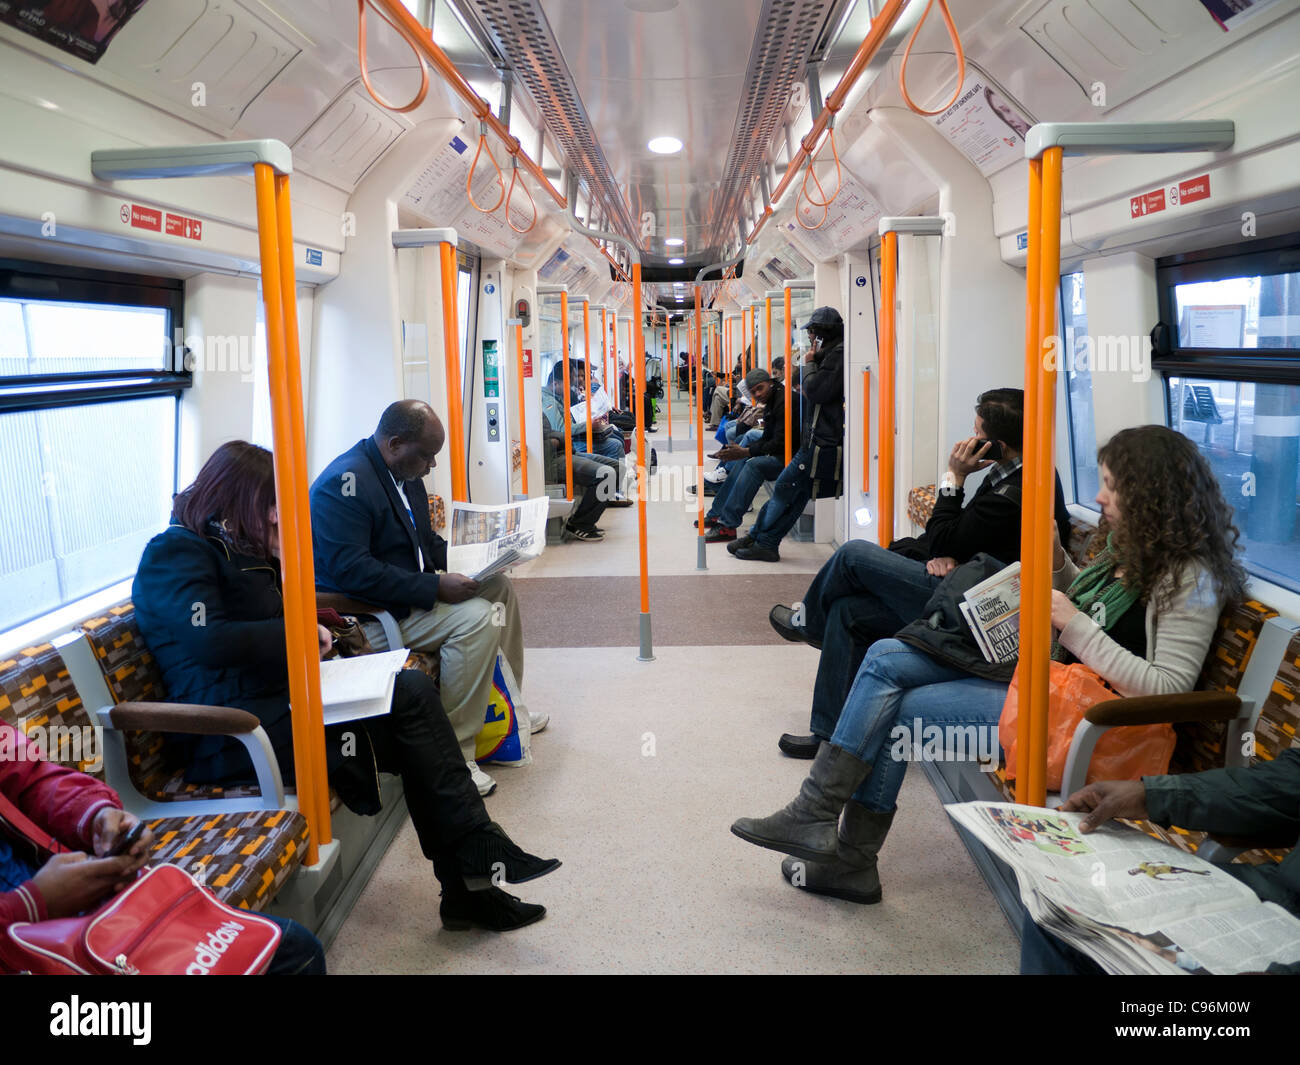 London Overground walk-through train carriage in Britain - Stock Image